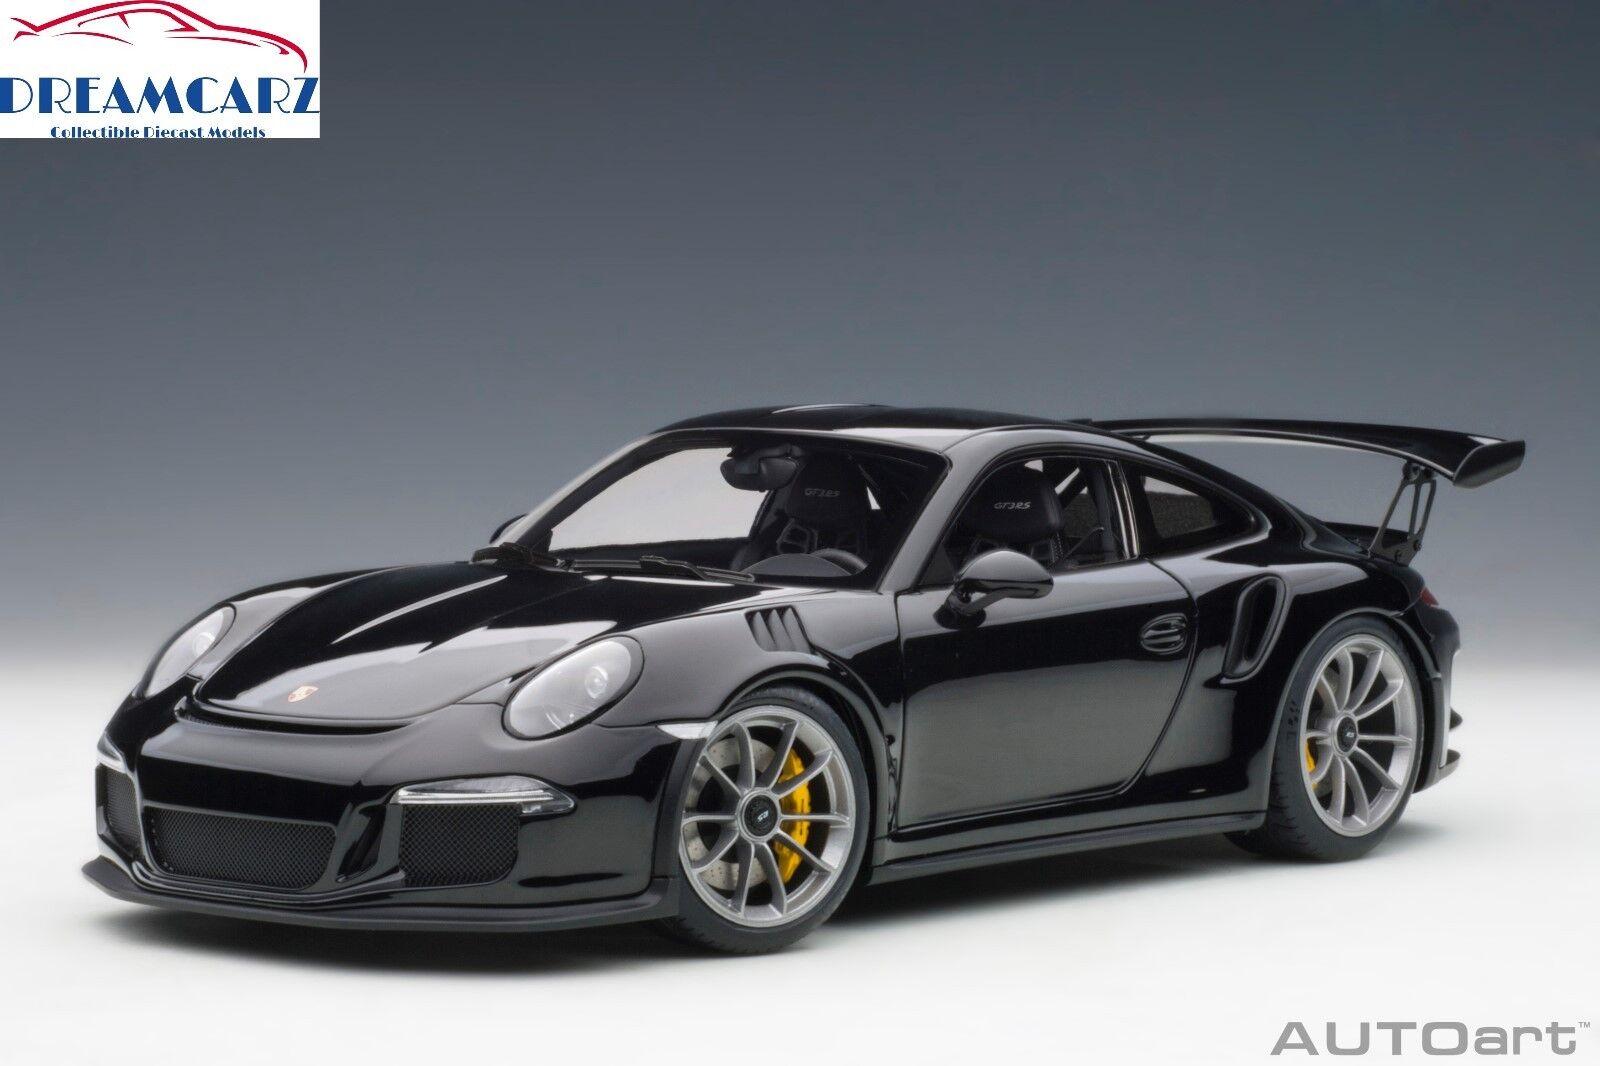 Autoart 78164 1 18 Porsche 911 GT3 RS-Negro Brillante Con Ruedas De Plata